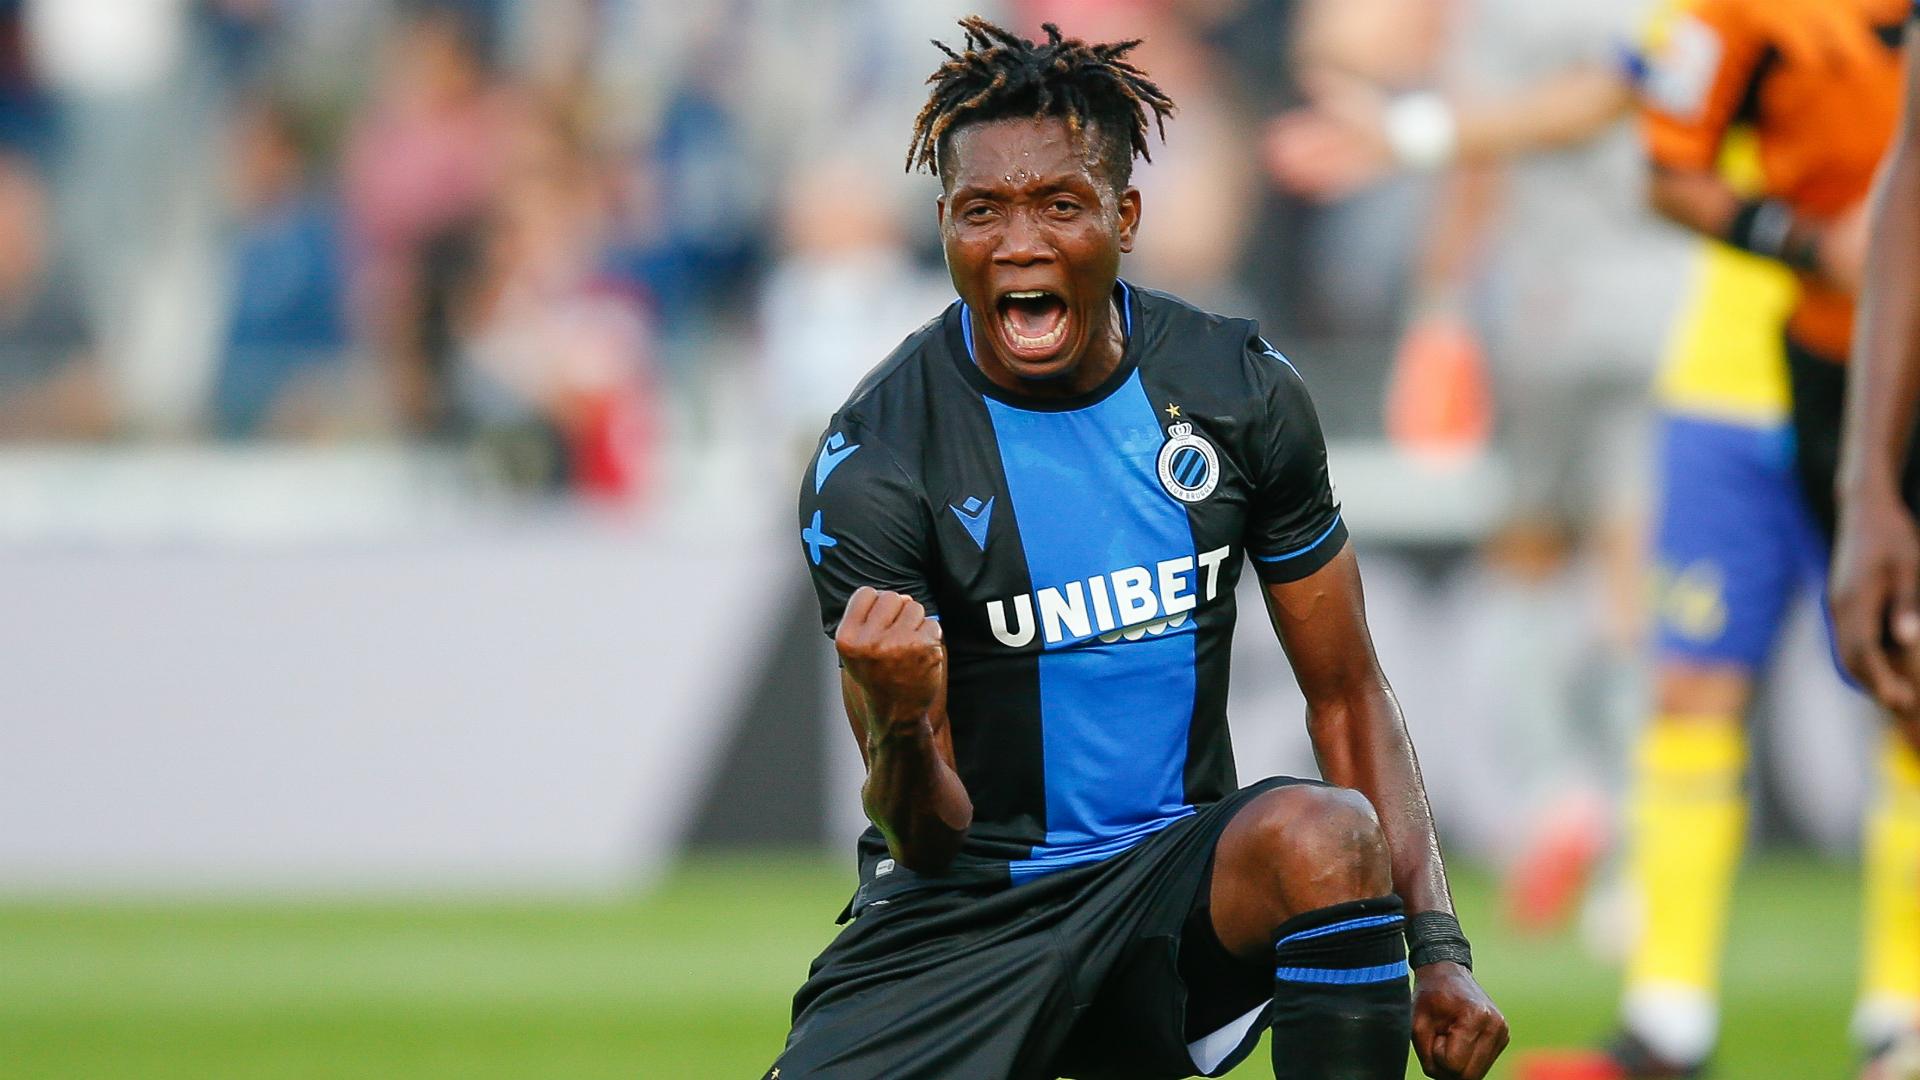 Okereke scores as Tau's Club Brugge defeat Ajagun's Kortrijk ...